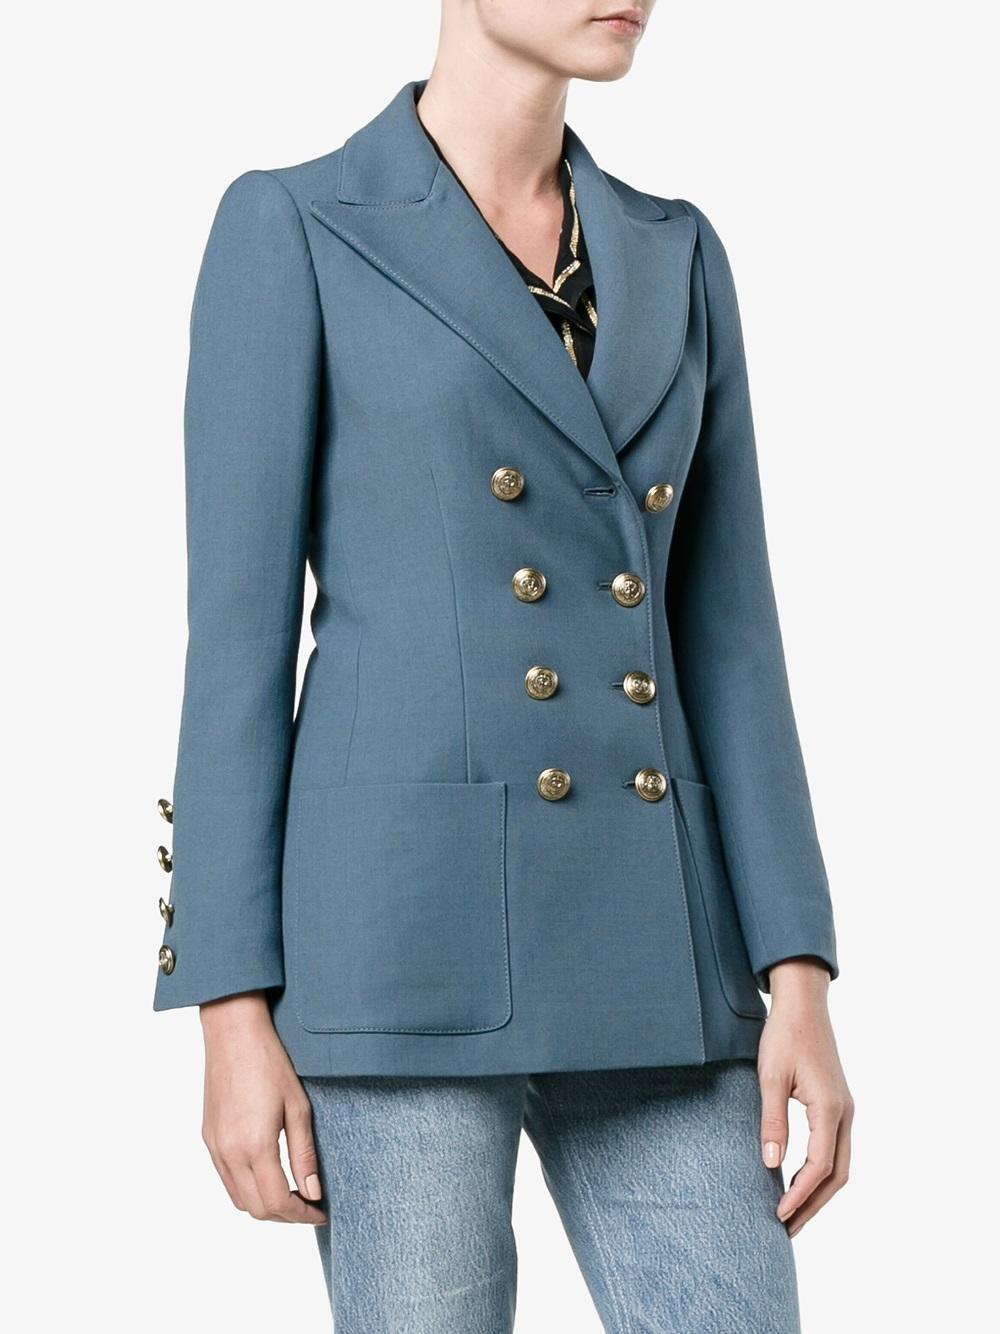 Philosophy di Lorenzo Serafini jacket in blue